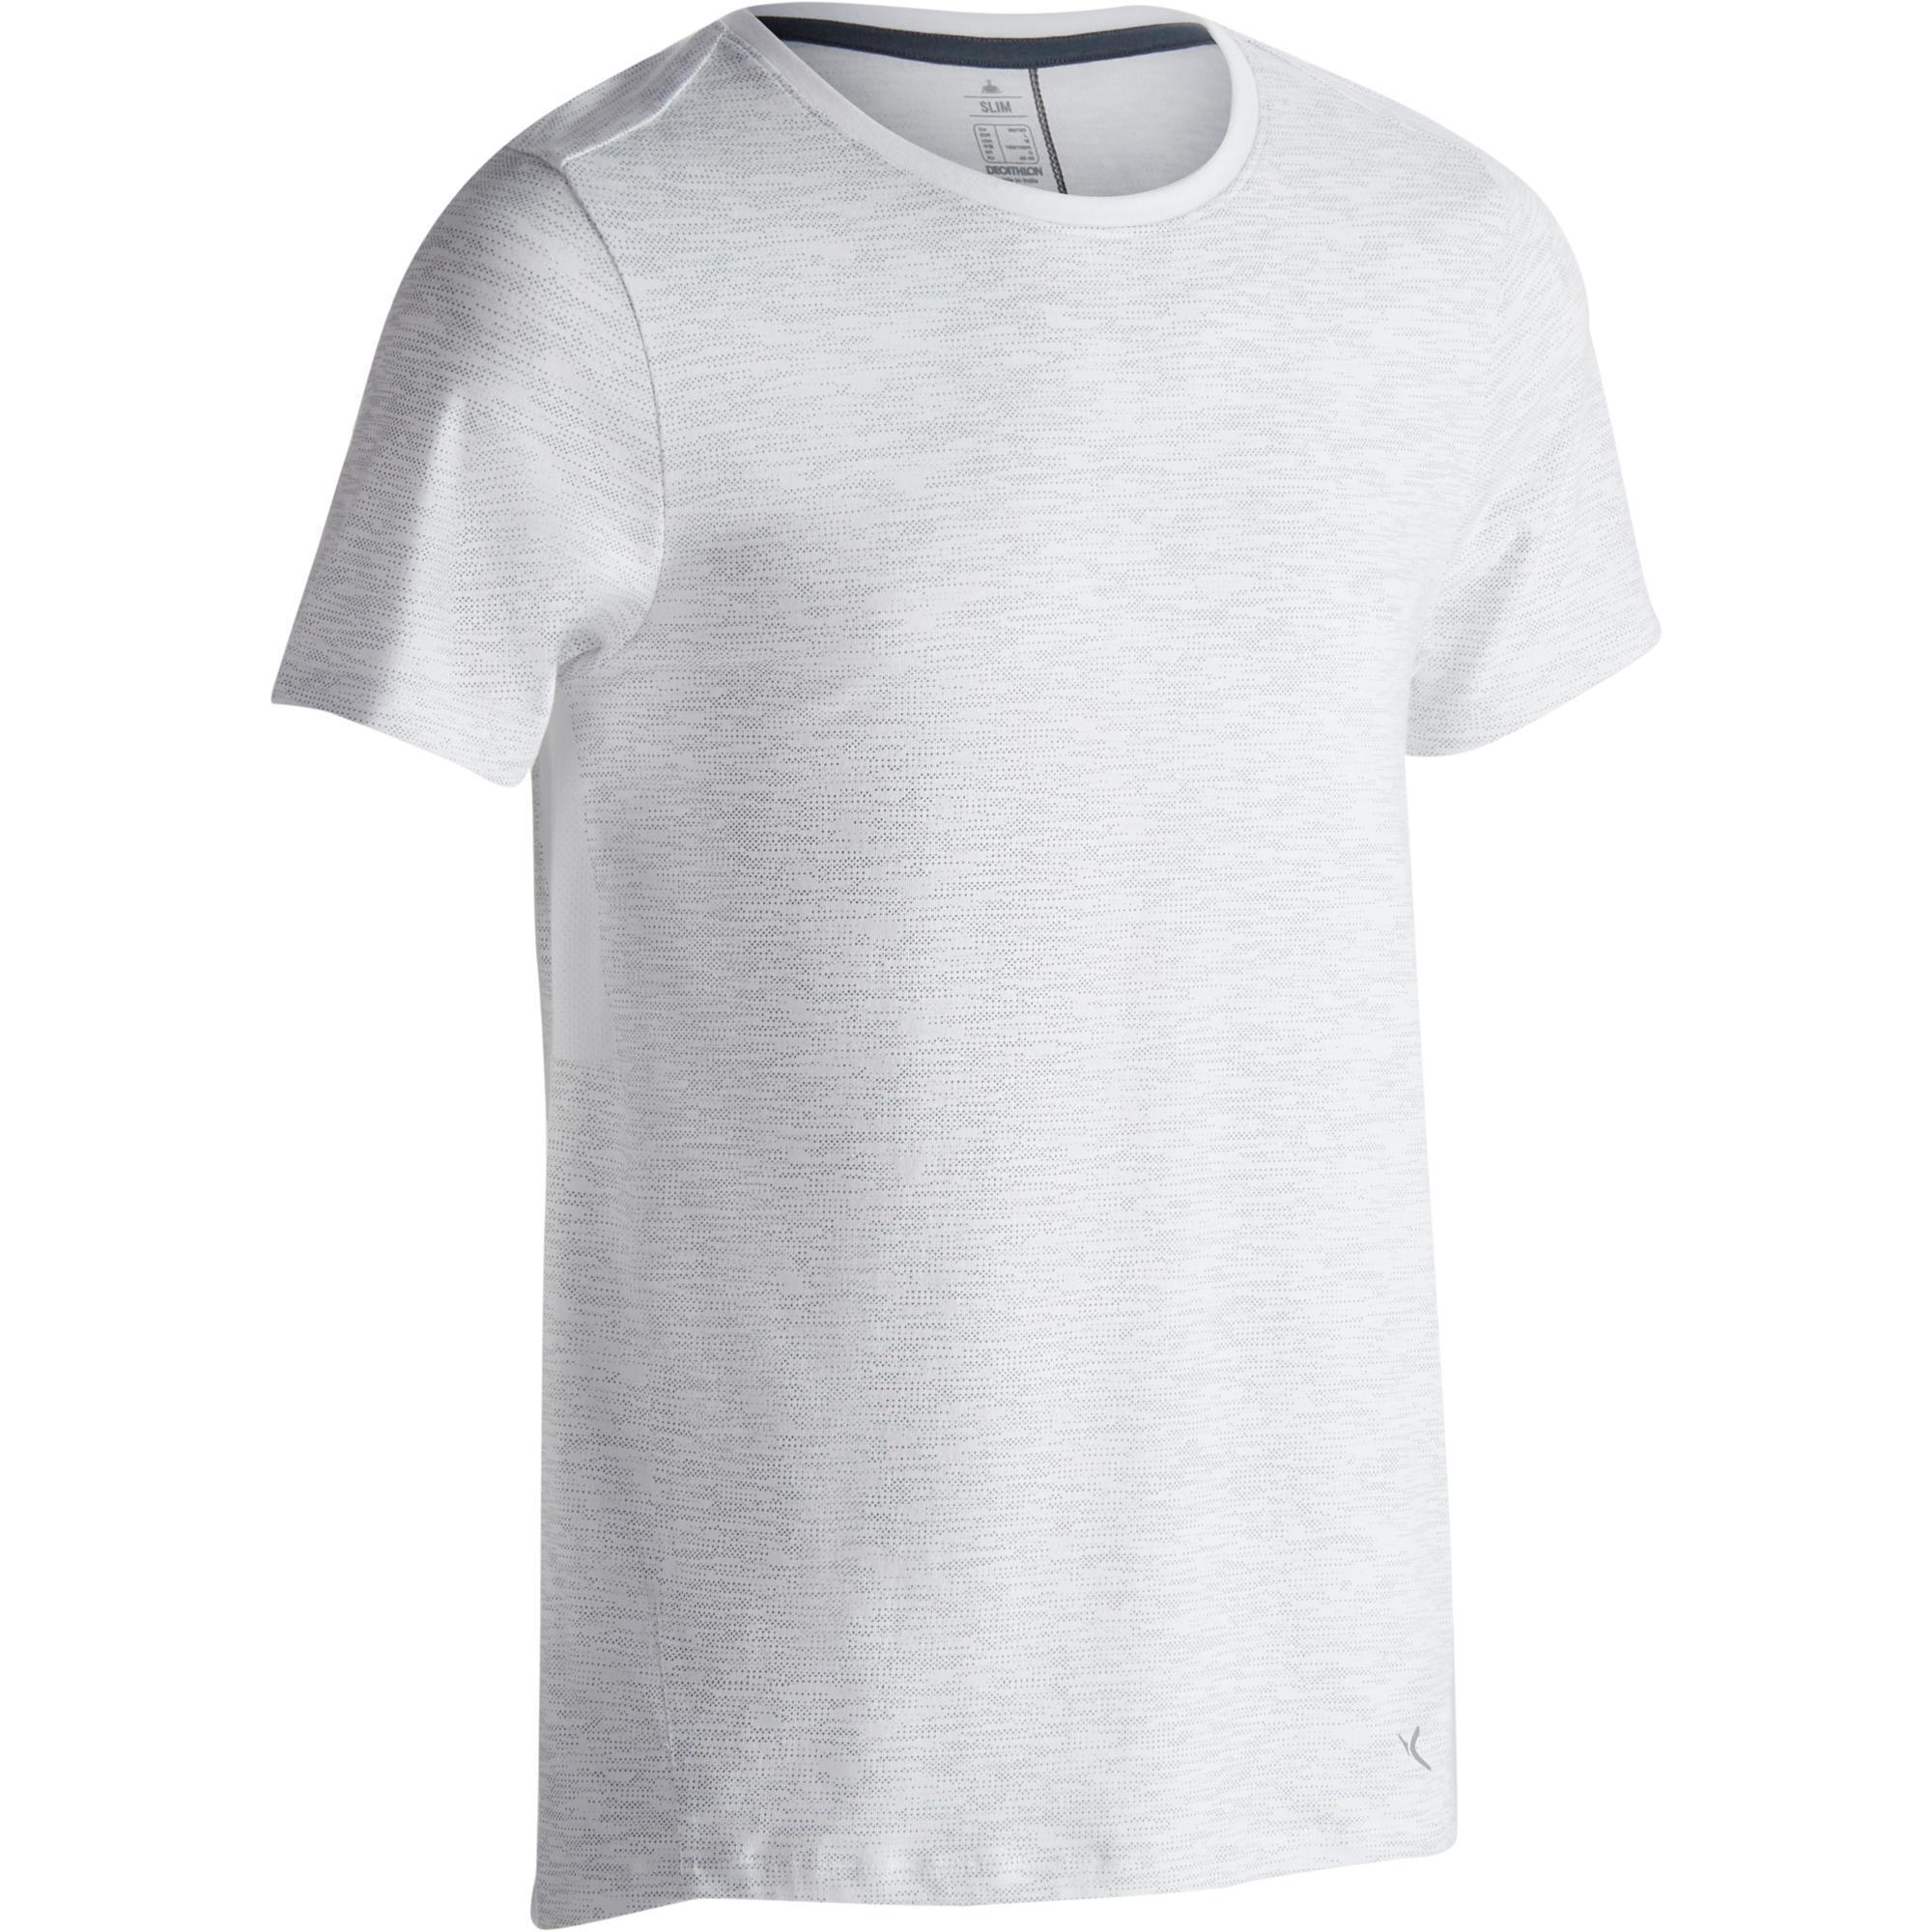 T-Shirt Gym 520 Regular Herren Fitness weiß